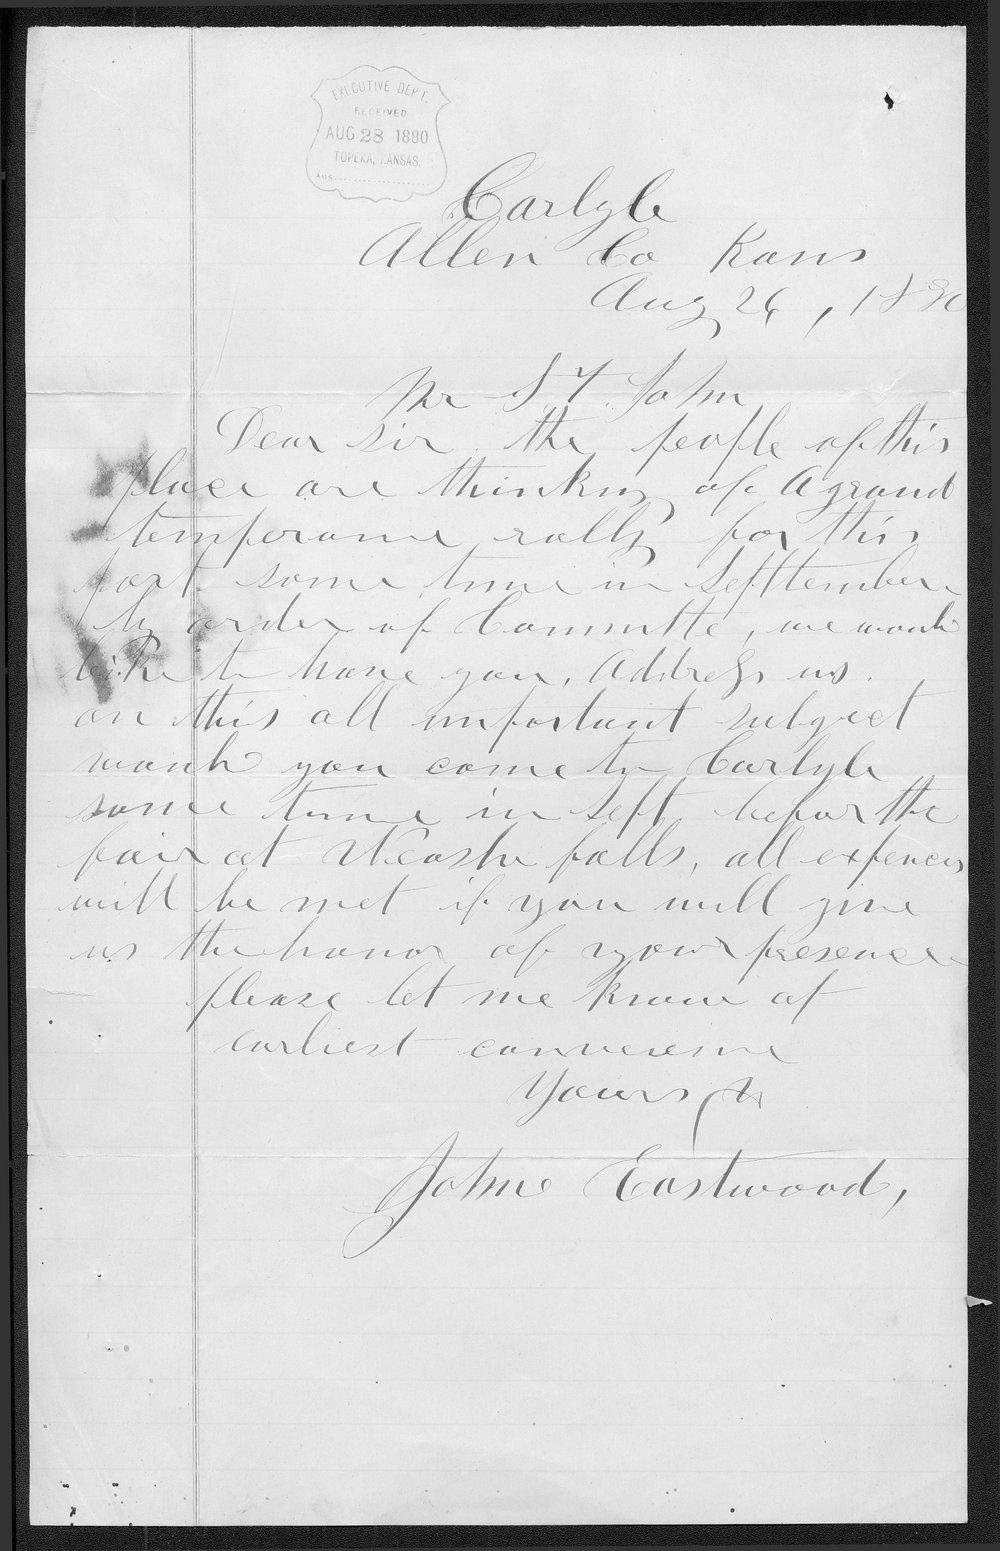 John Eastwood to Governor John St. John